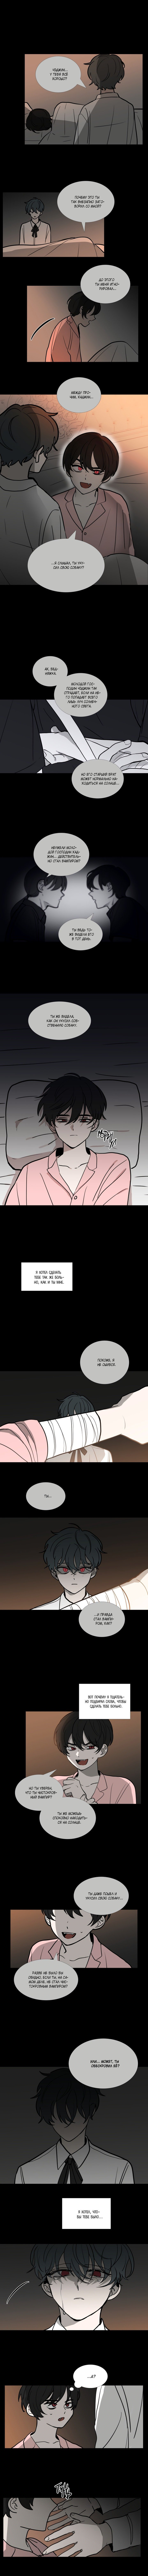 Манга Сердце Вампира - Глава 47 Страница 1